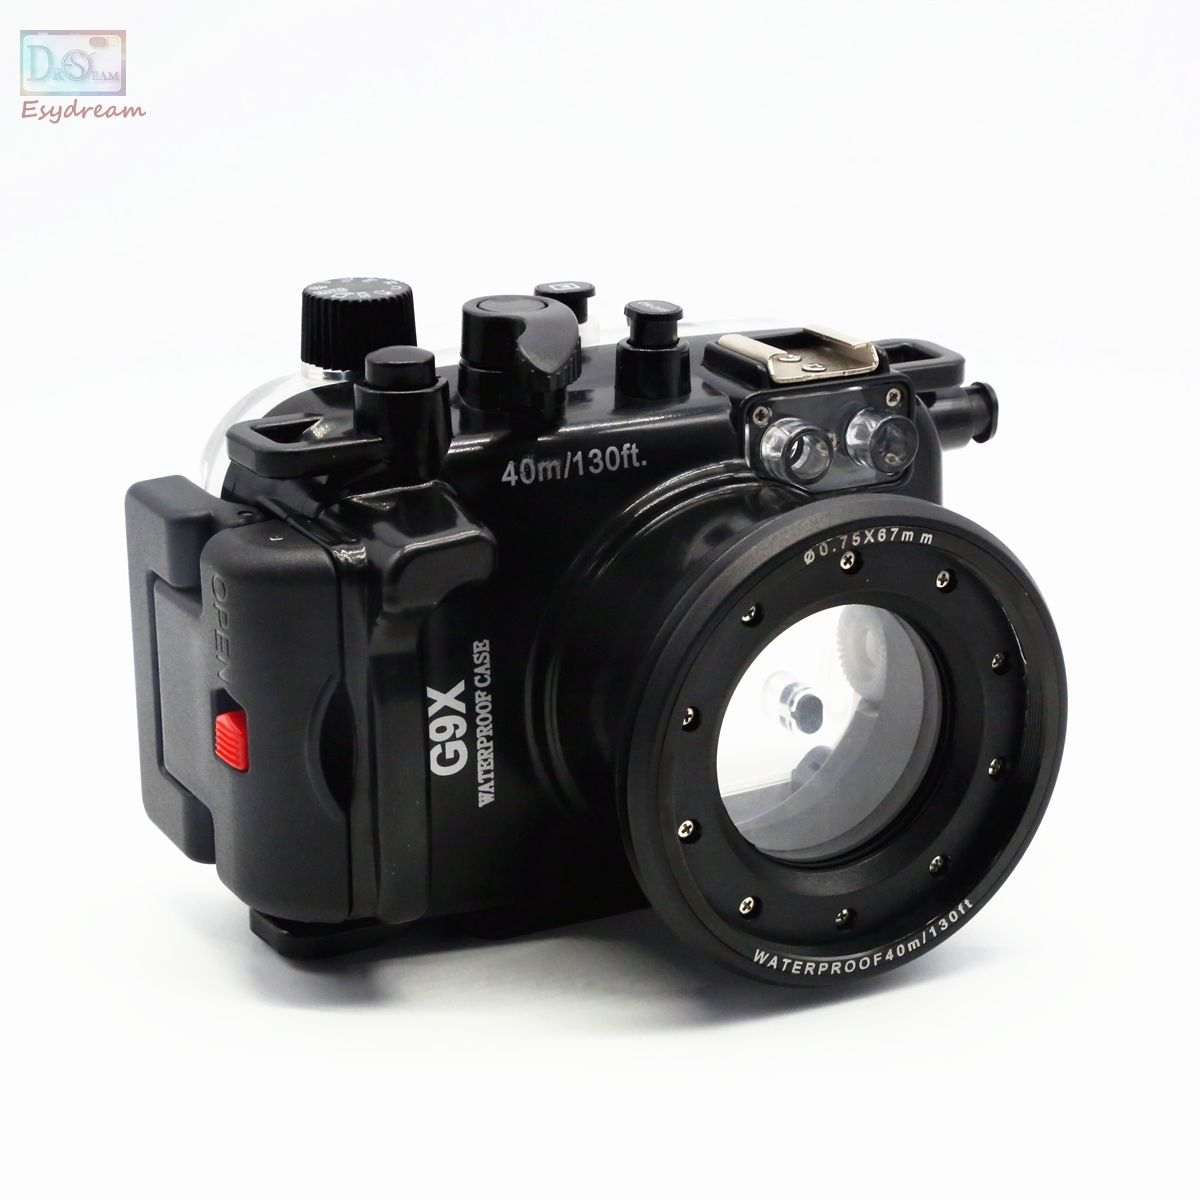 Waterproof Underwater Housing Camera Housing Case for canon PowerShot G9X 24-100mm Lens 40m waterproof underwater housing case for canon powershot g7x mark ii camera